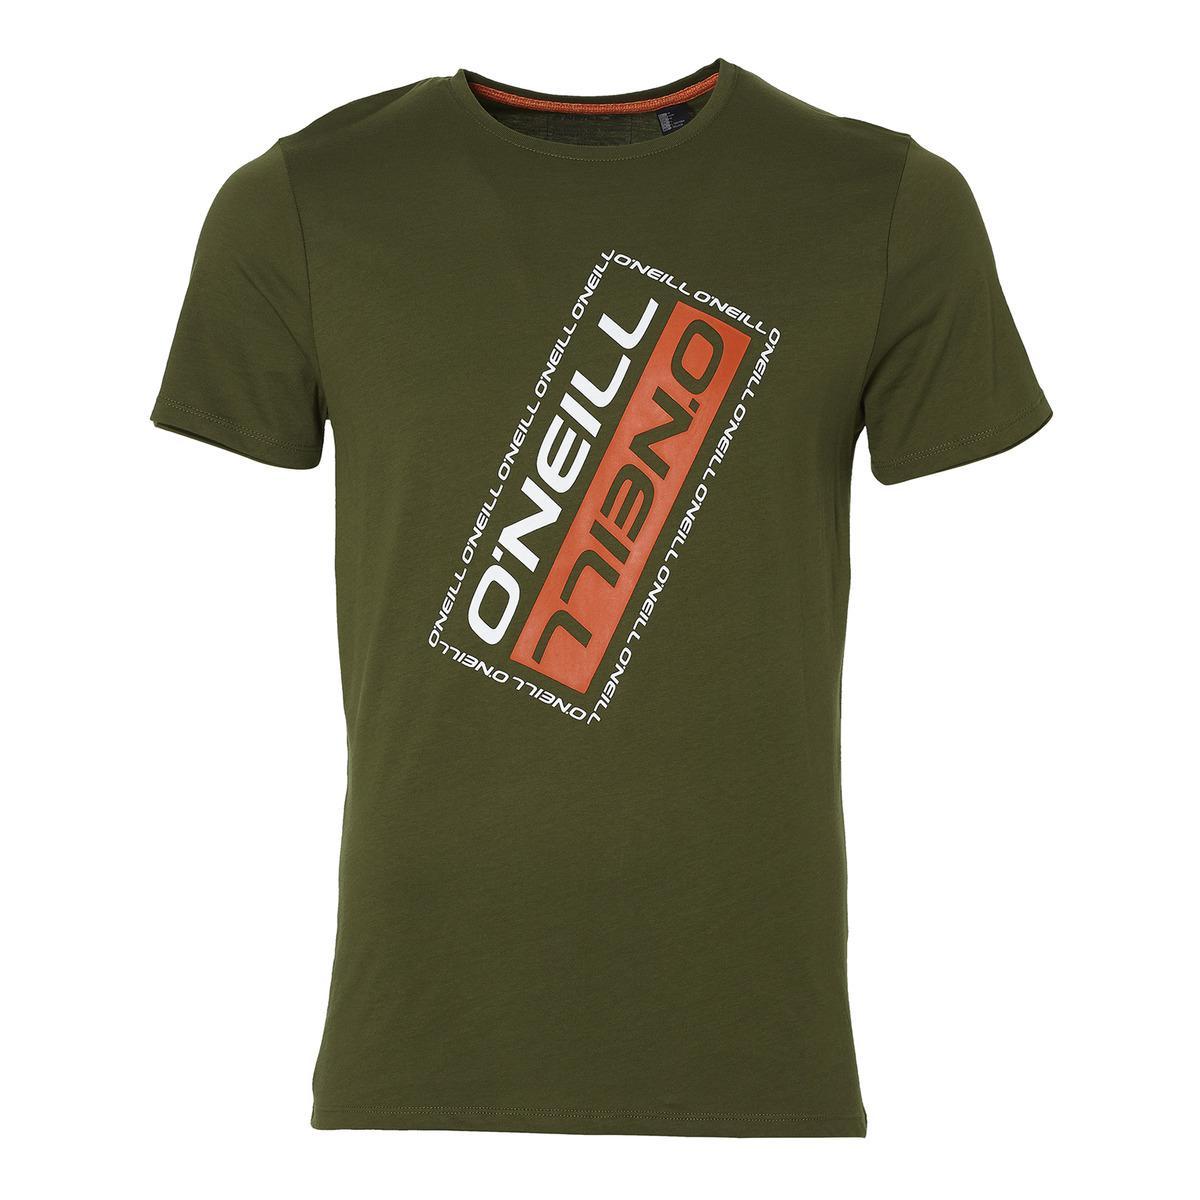 620cf67be69181 O neill Sportswear Oneill Slanted T-shirt in Green for Men - Lyst